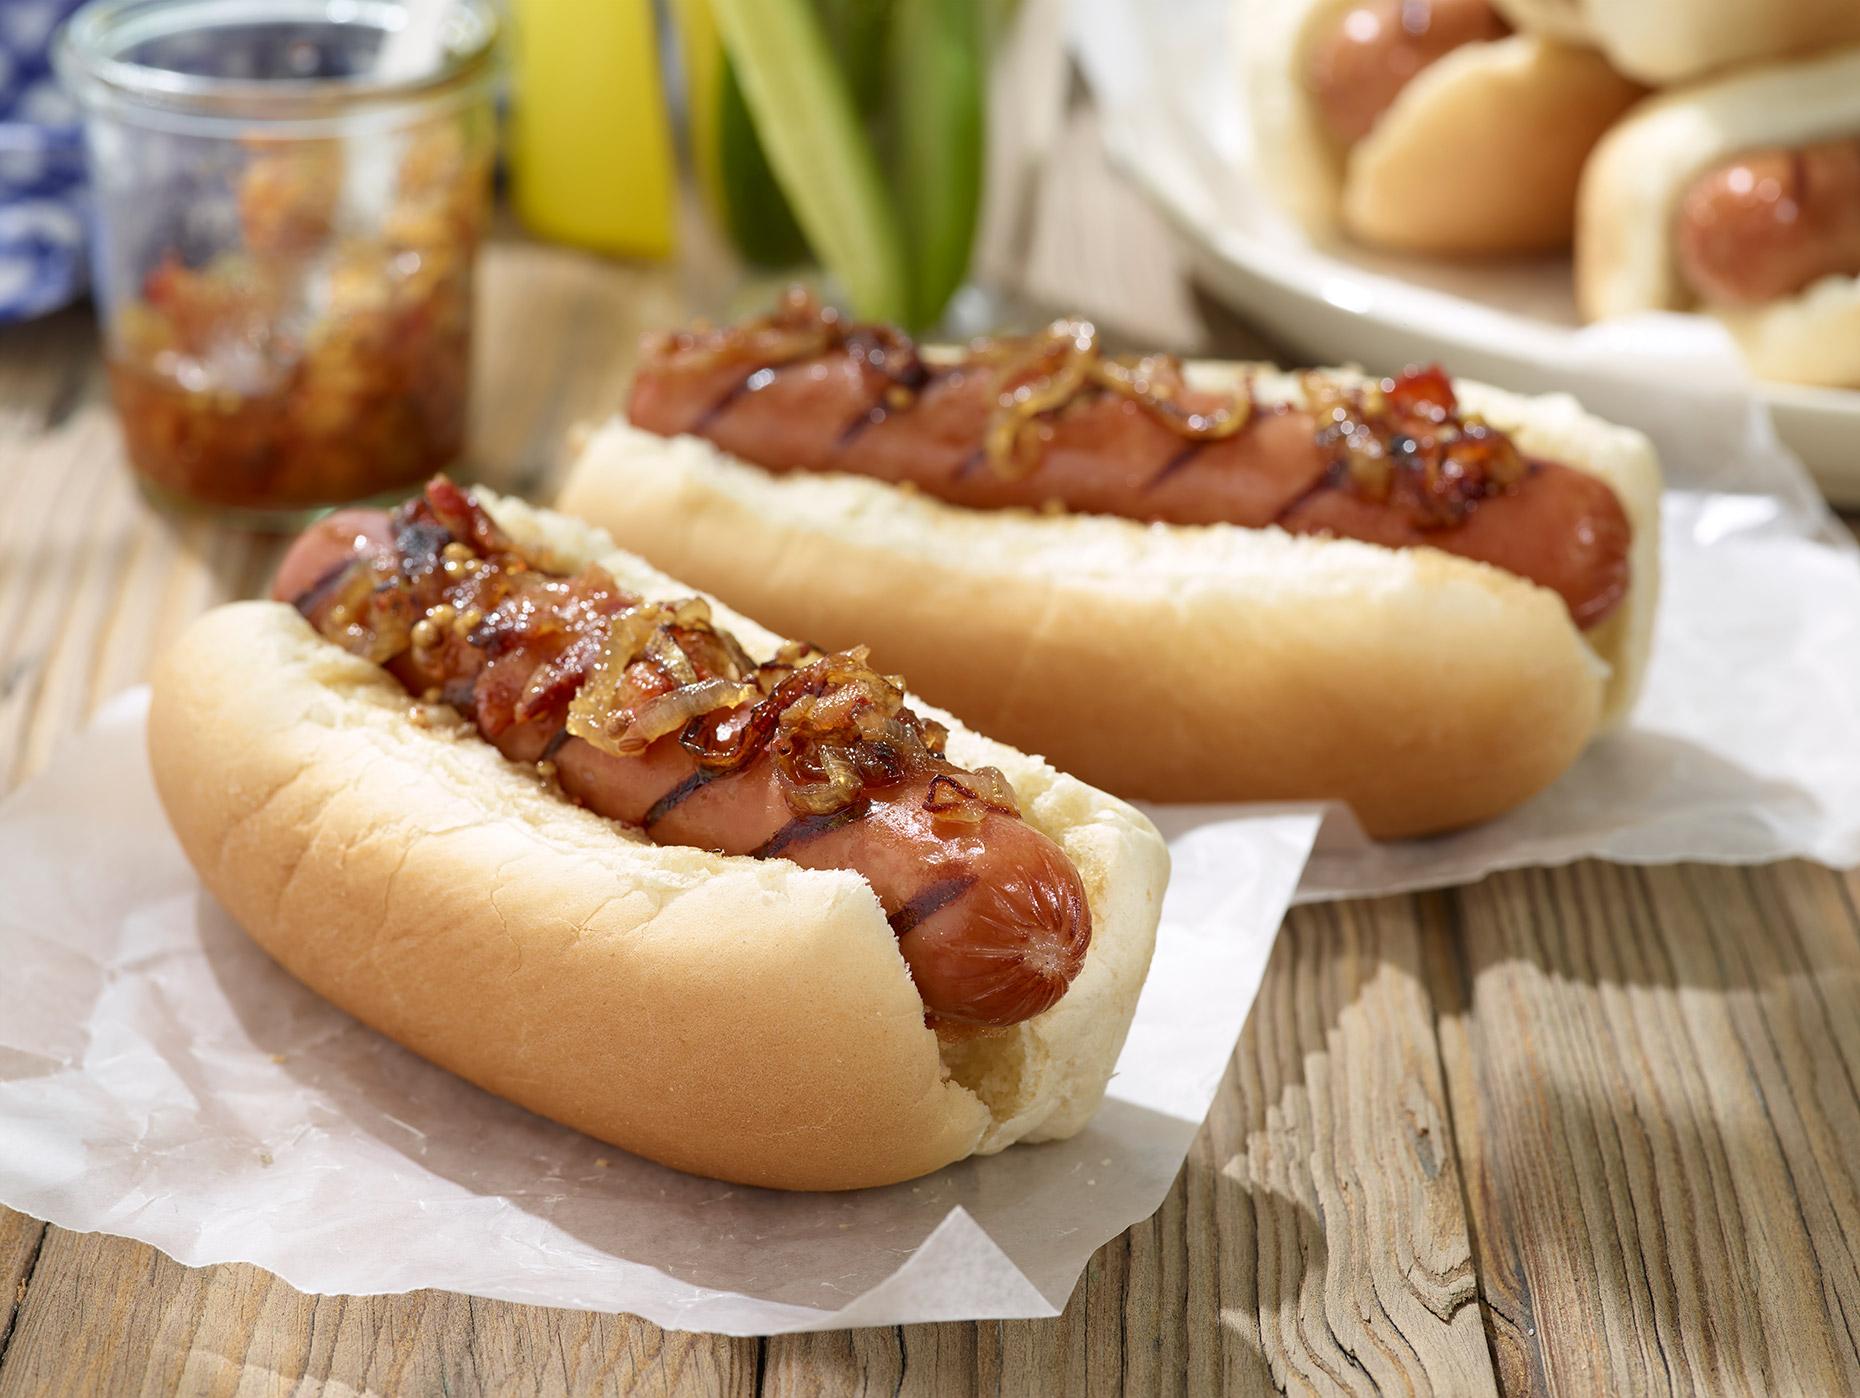 Smoked-Sausage-with-Smoked-Bacon-and-Onion-Marmalade_241.jpg